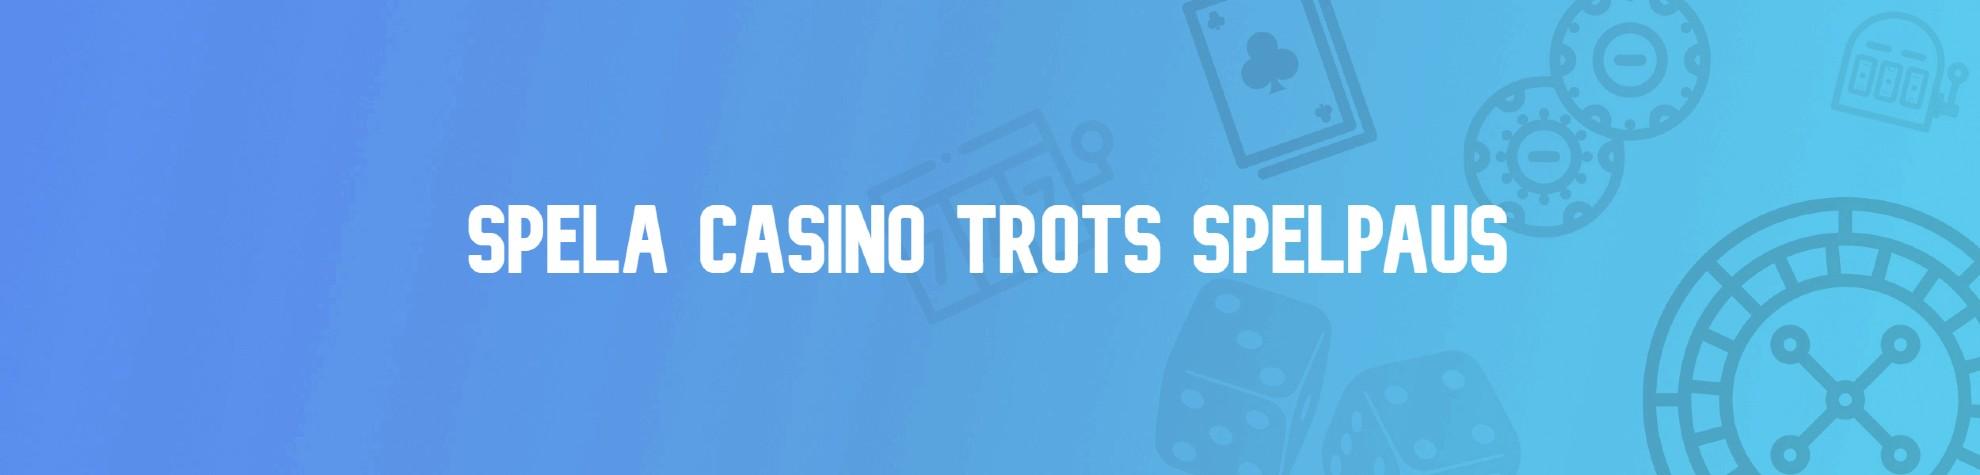 casino-utan-spelpaus-2021